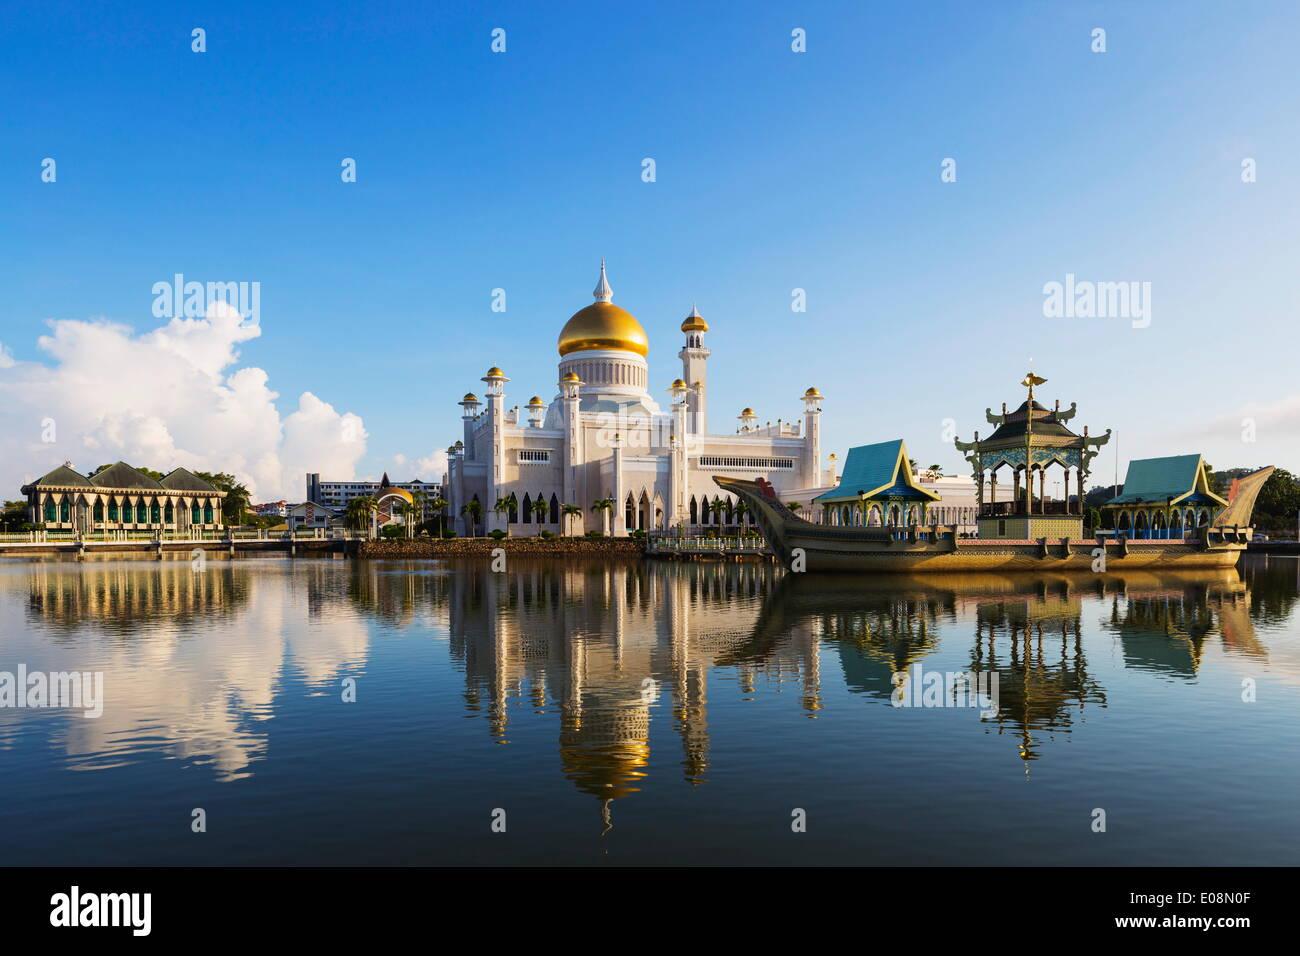 Omar Ali Saifuddien Mosque, Bandar Seri Begawan, Brunei, Borneo, Southeast Asia, Asia Stock Photo